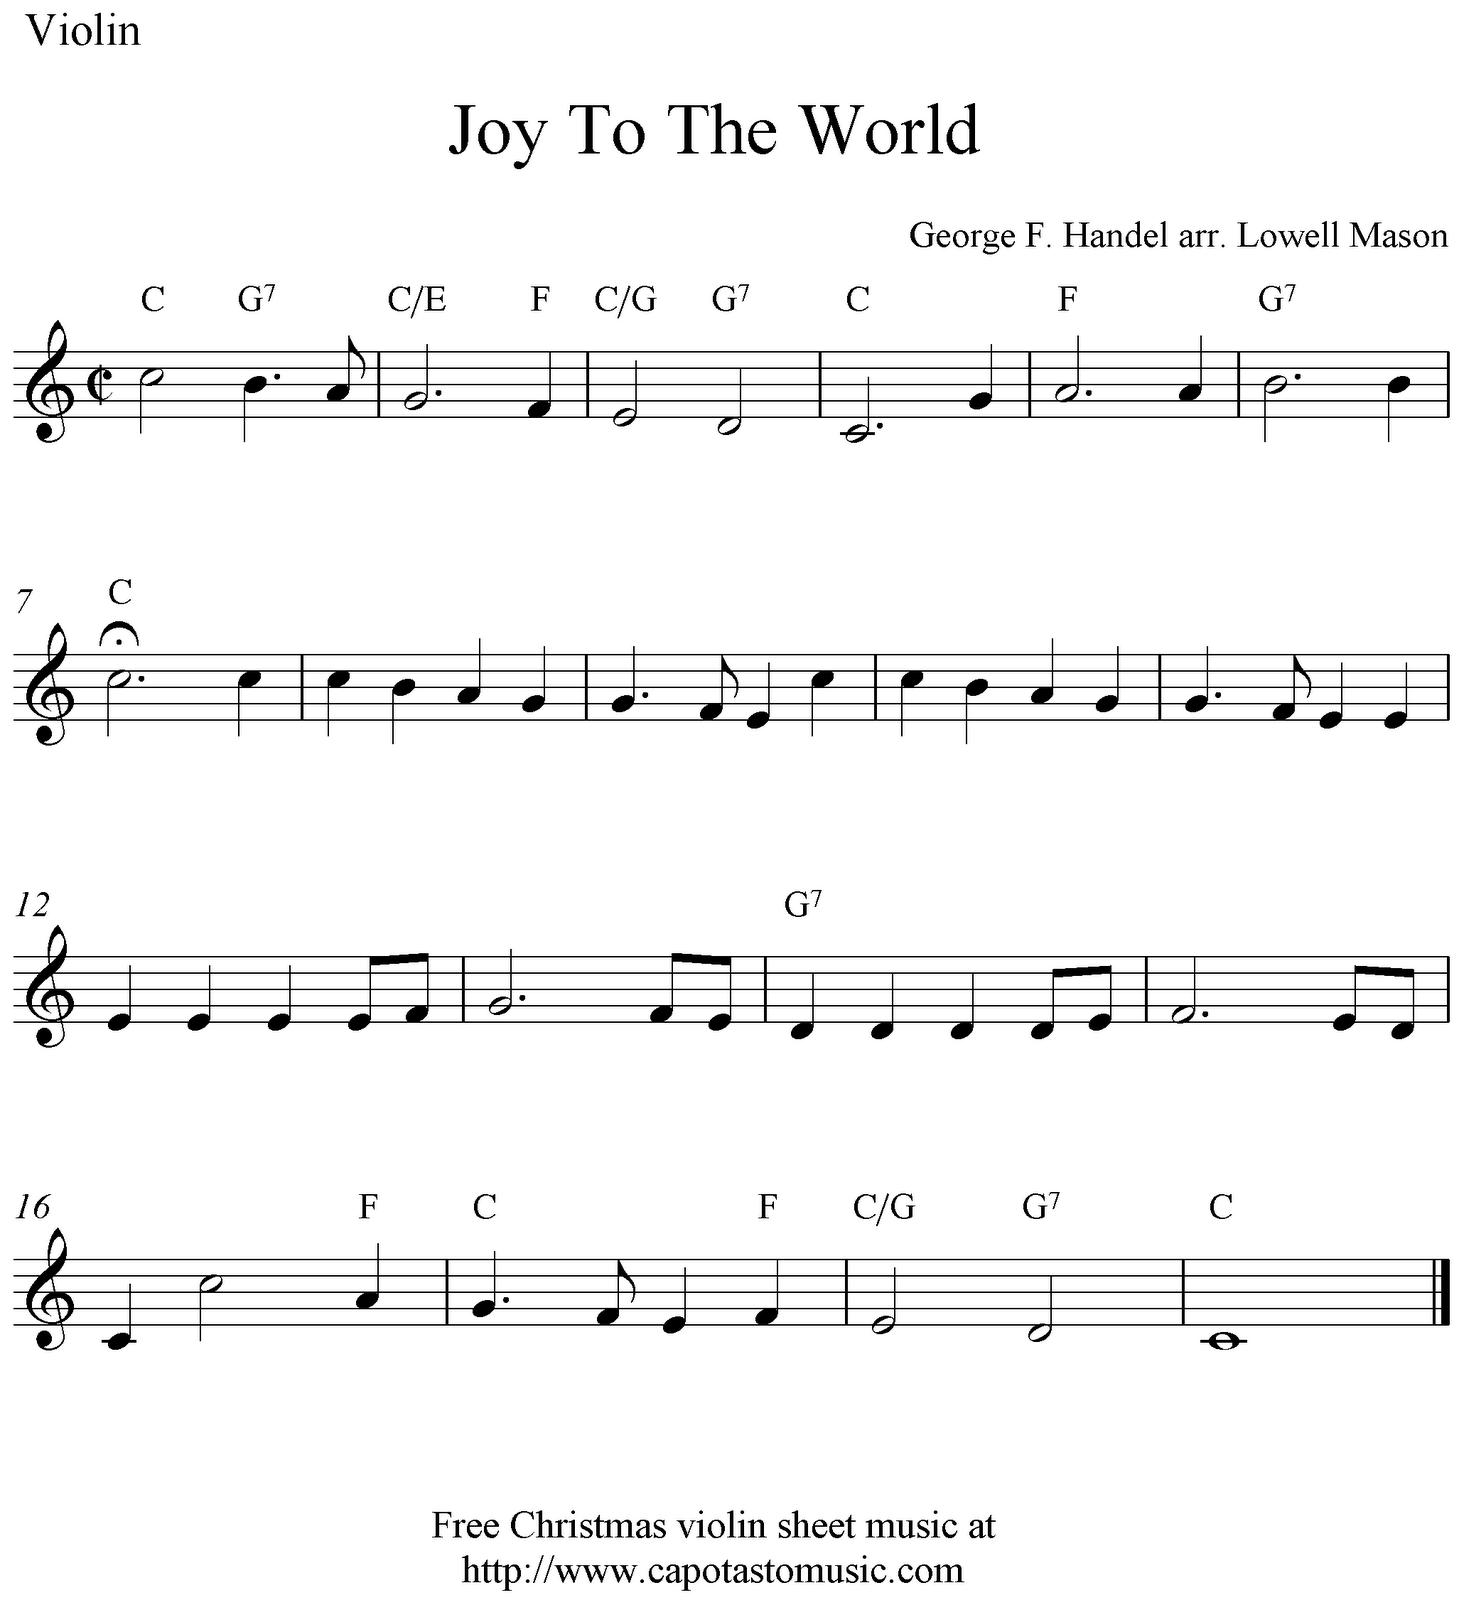 Joy To The World, free Christmas violin sheet music notes